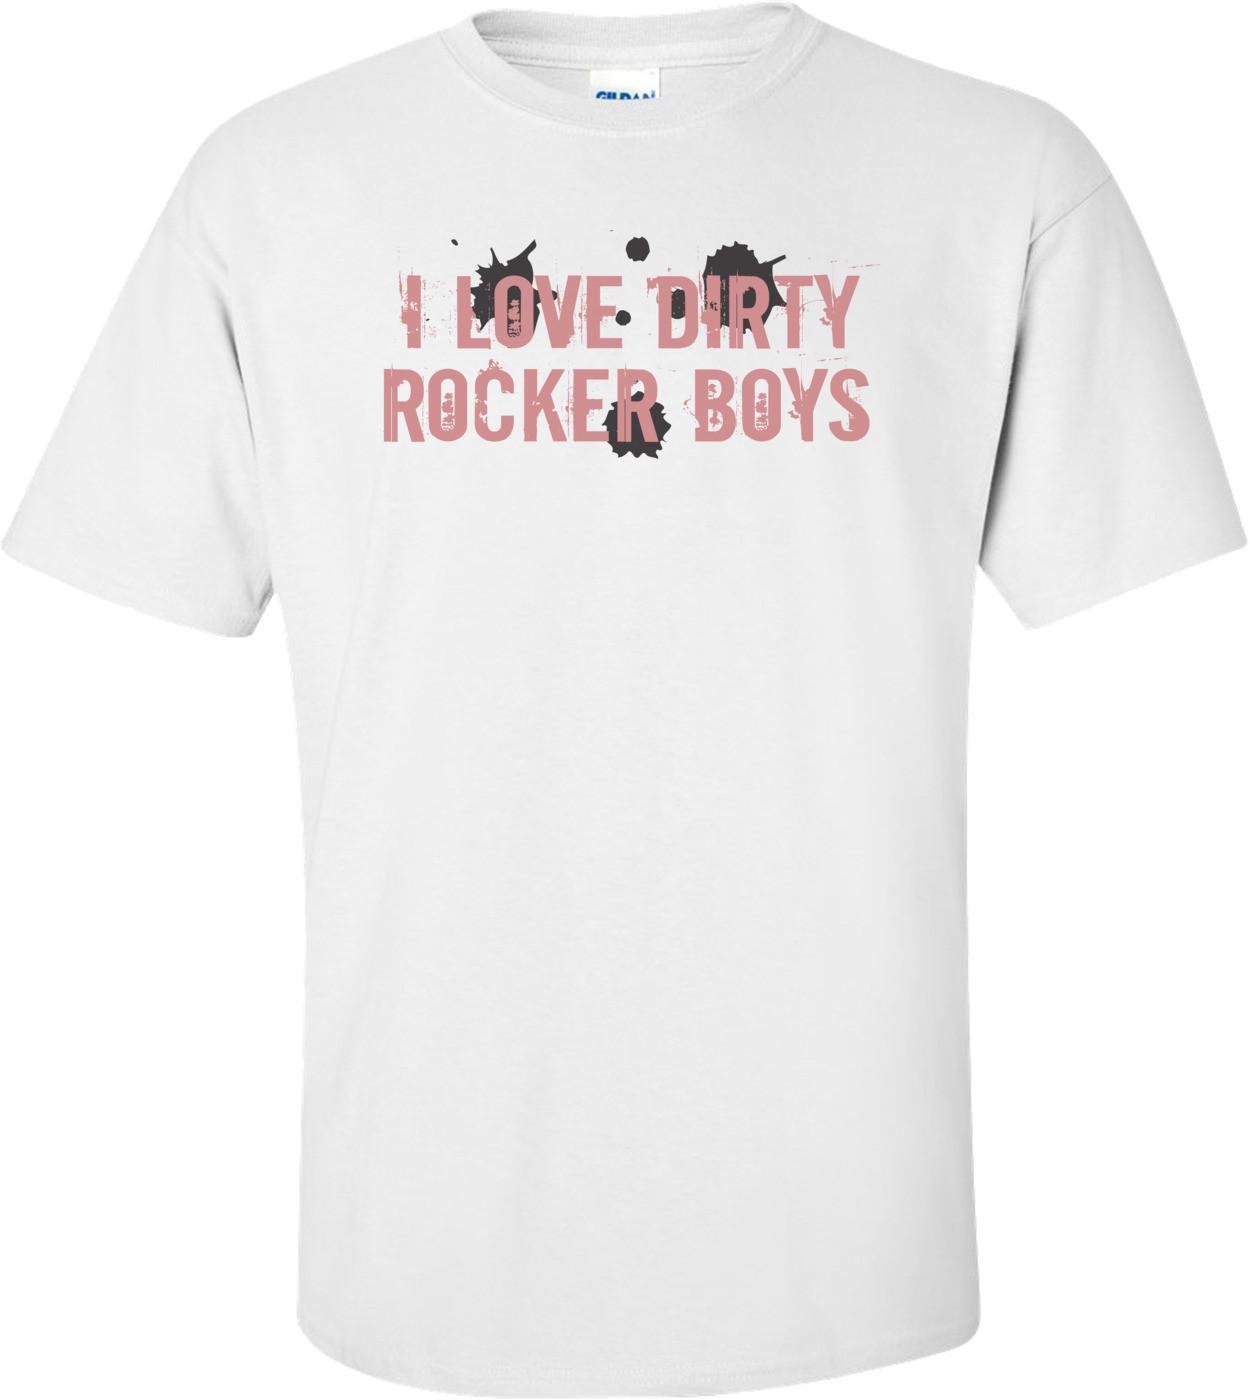 I Love Dirty Rocker Boys T-Shirt